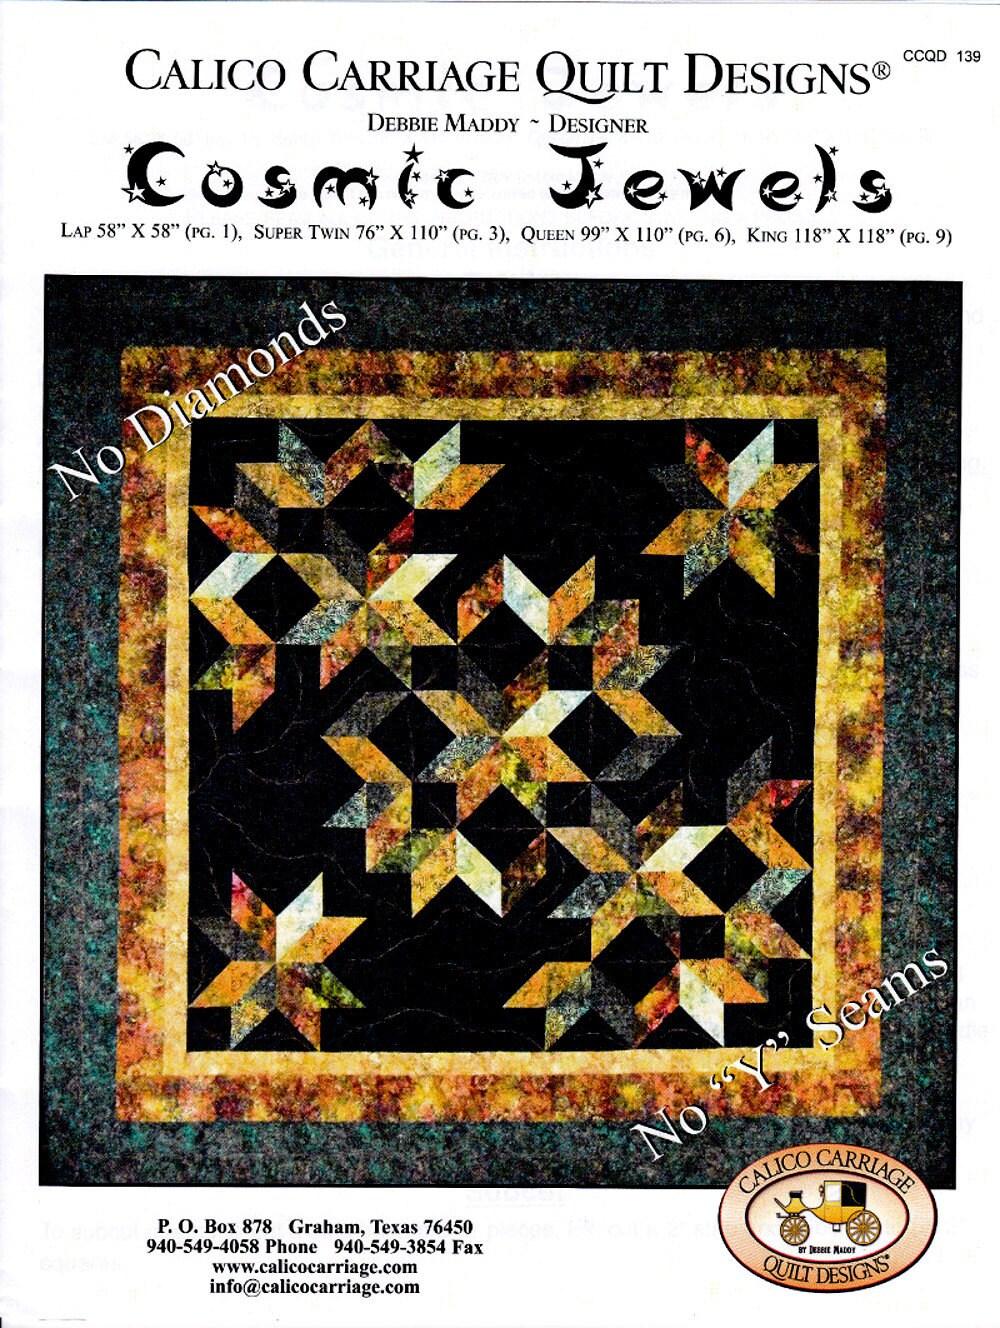 COSMIC JEWELS No Y Seams!! By: Debbie Maddy - Calico Carriage ... : calico carriage quilt designs - Adamdwight.com